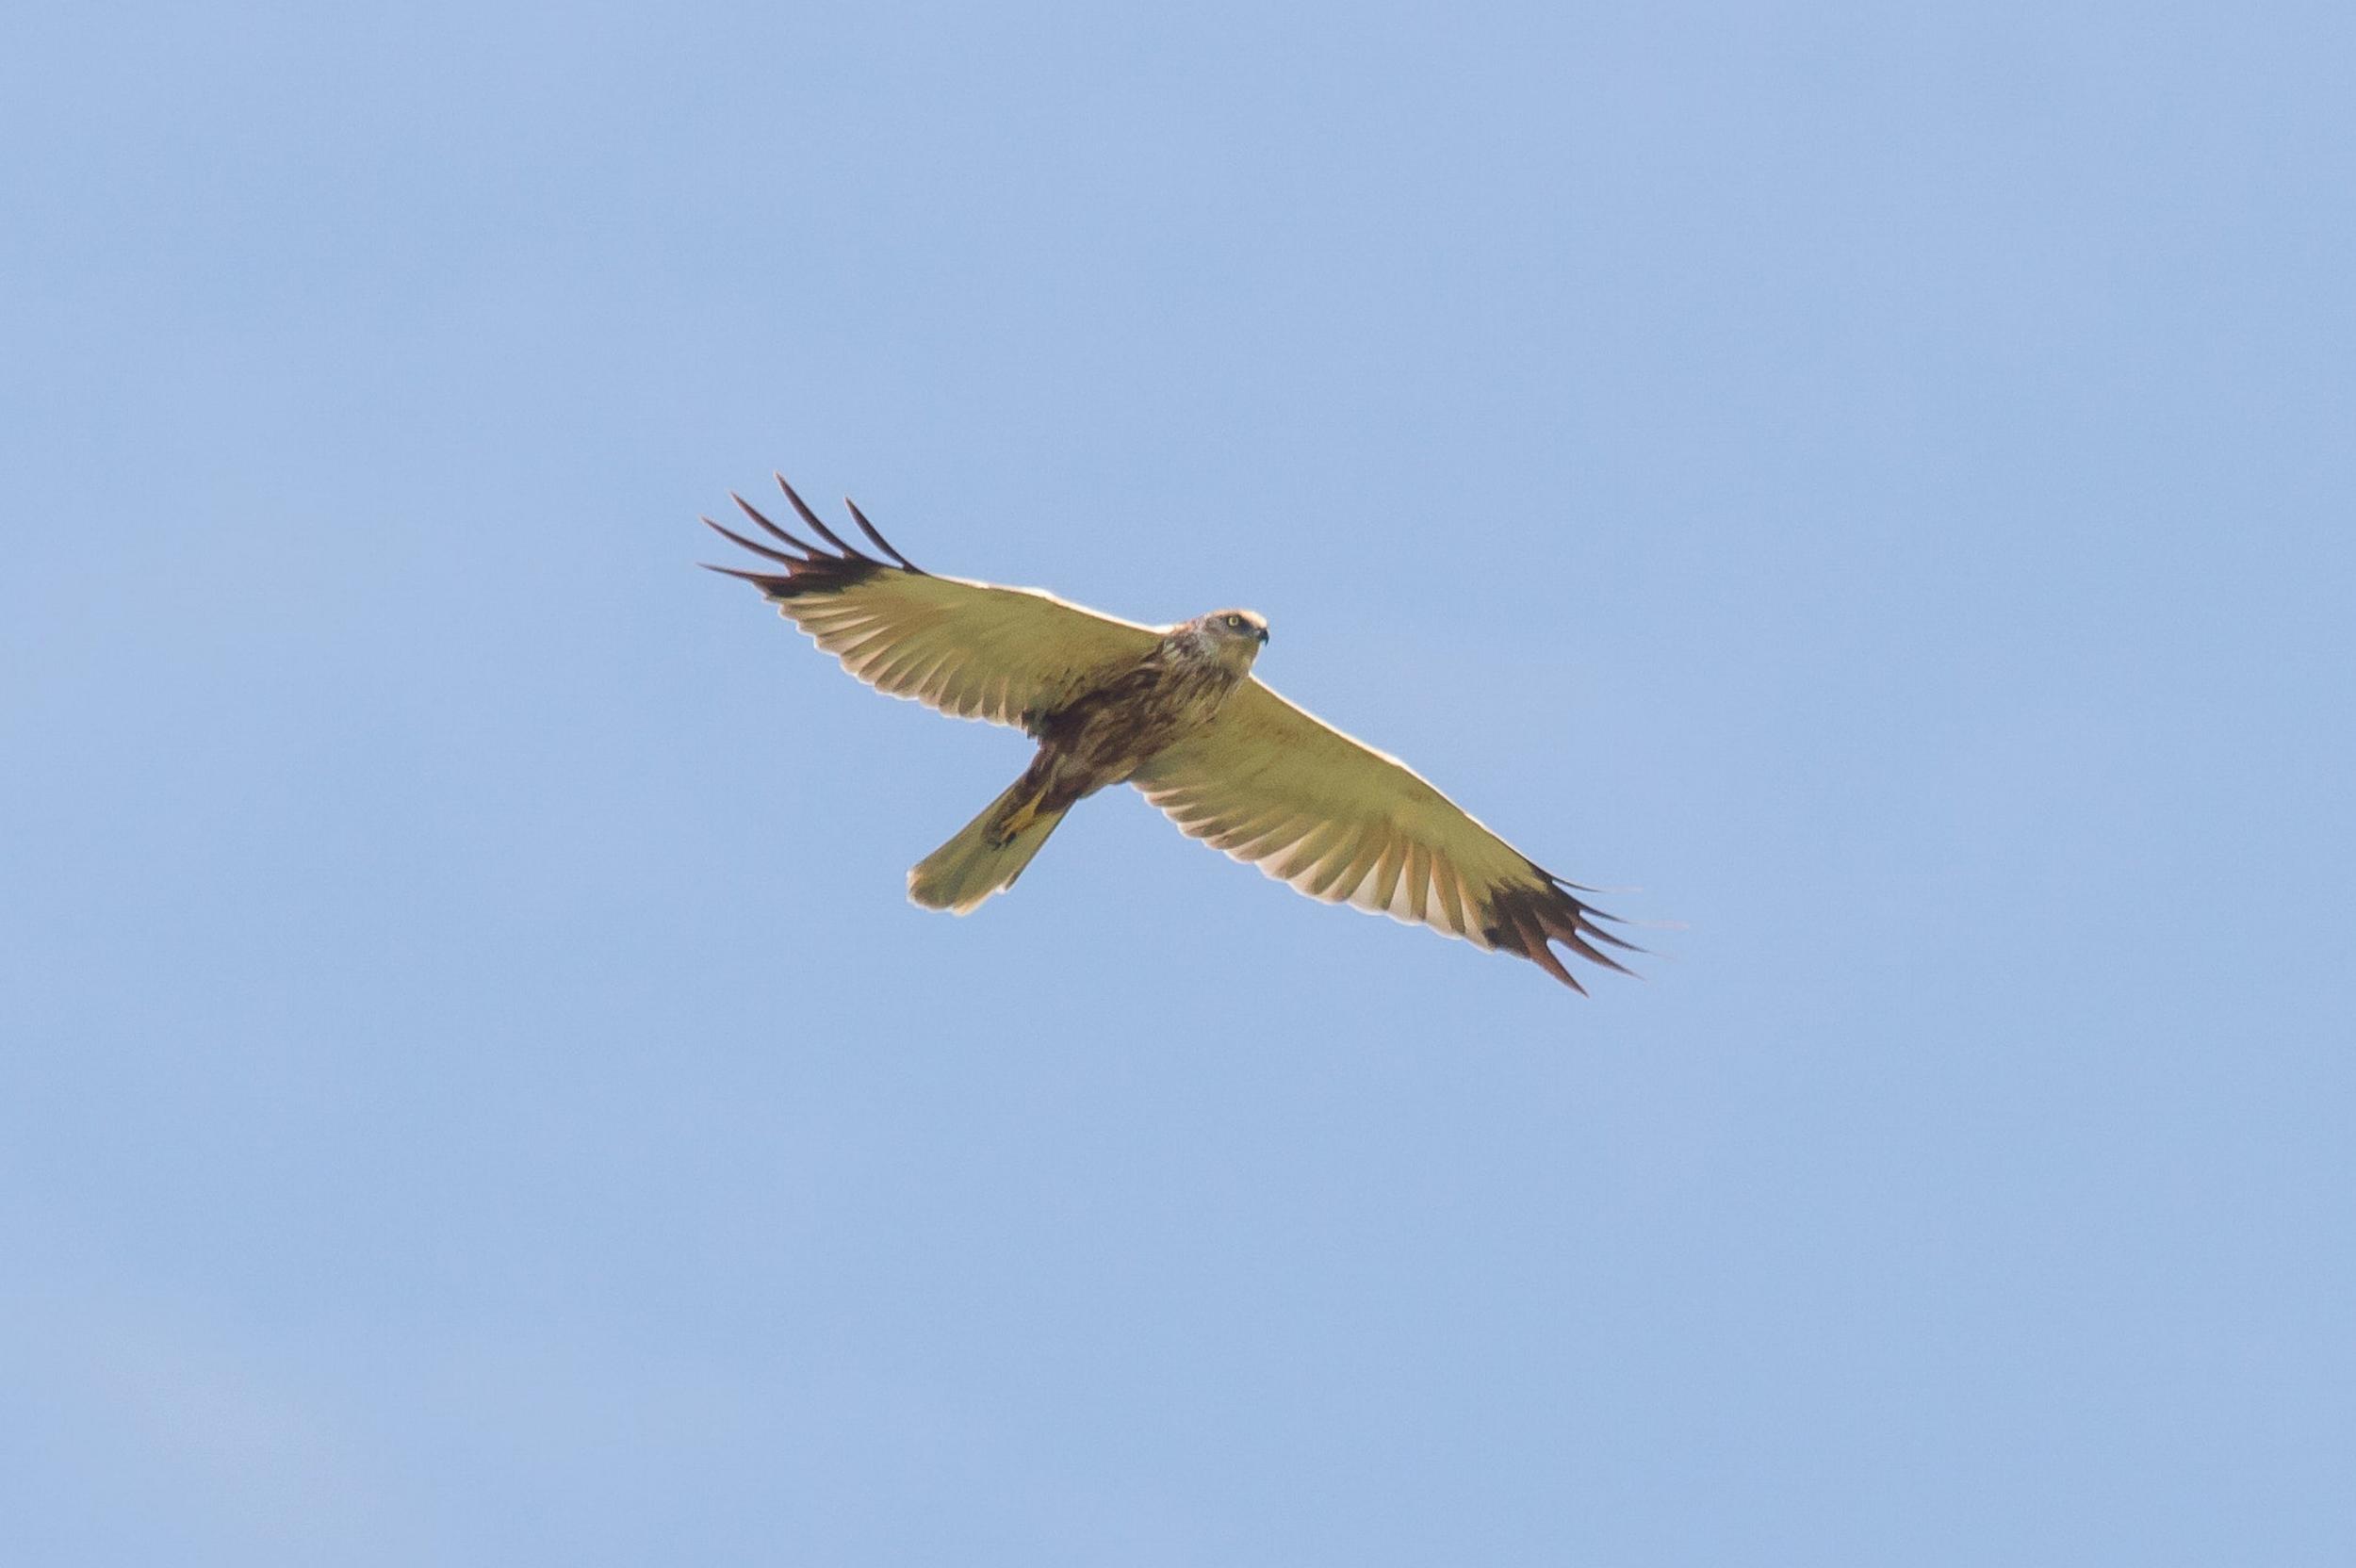 Adult Male Marsh Harrier. Photo by Tohar Tal.